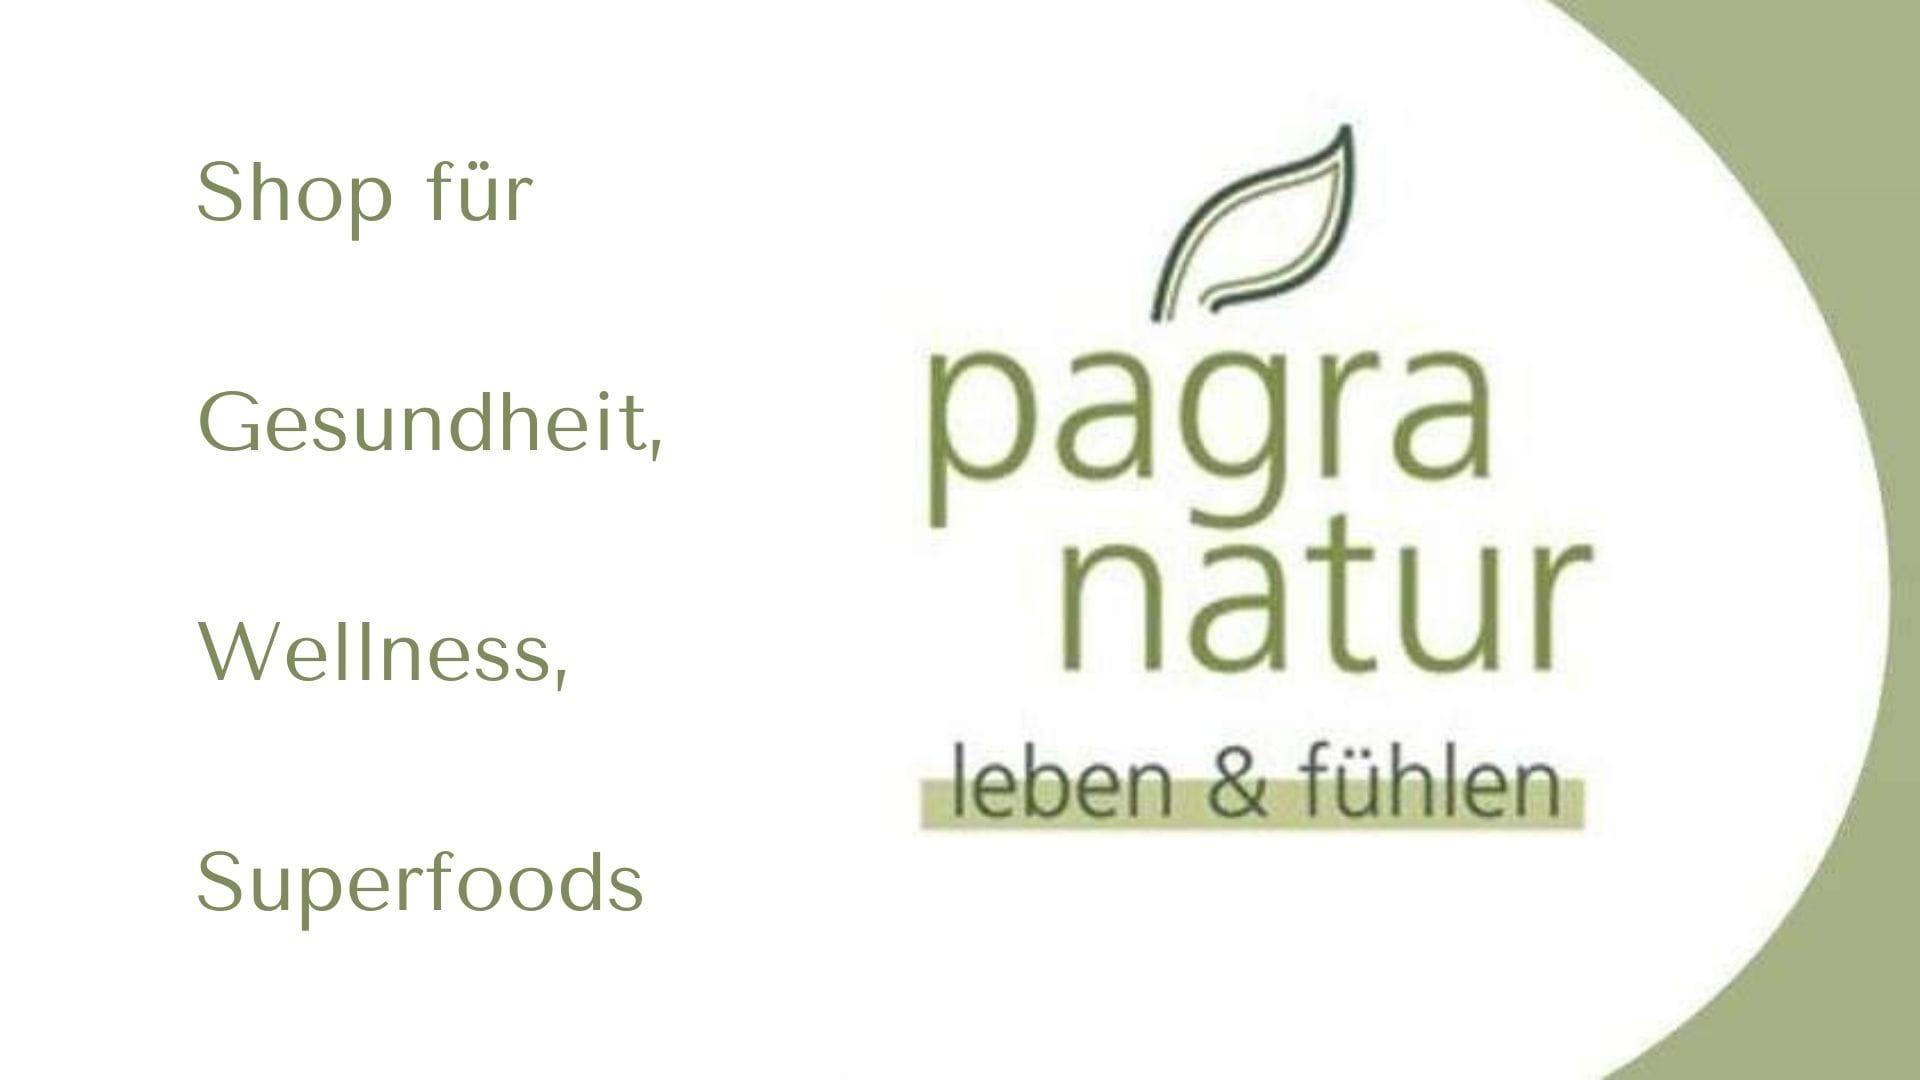 pagra natur logo